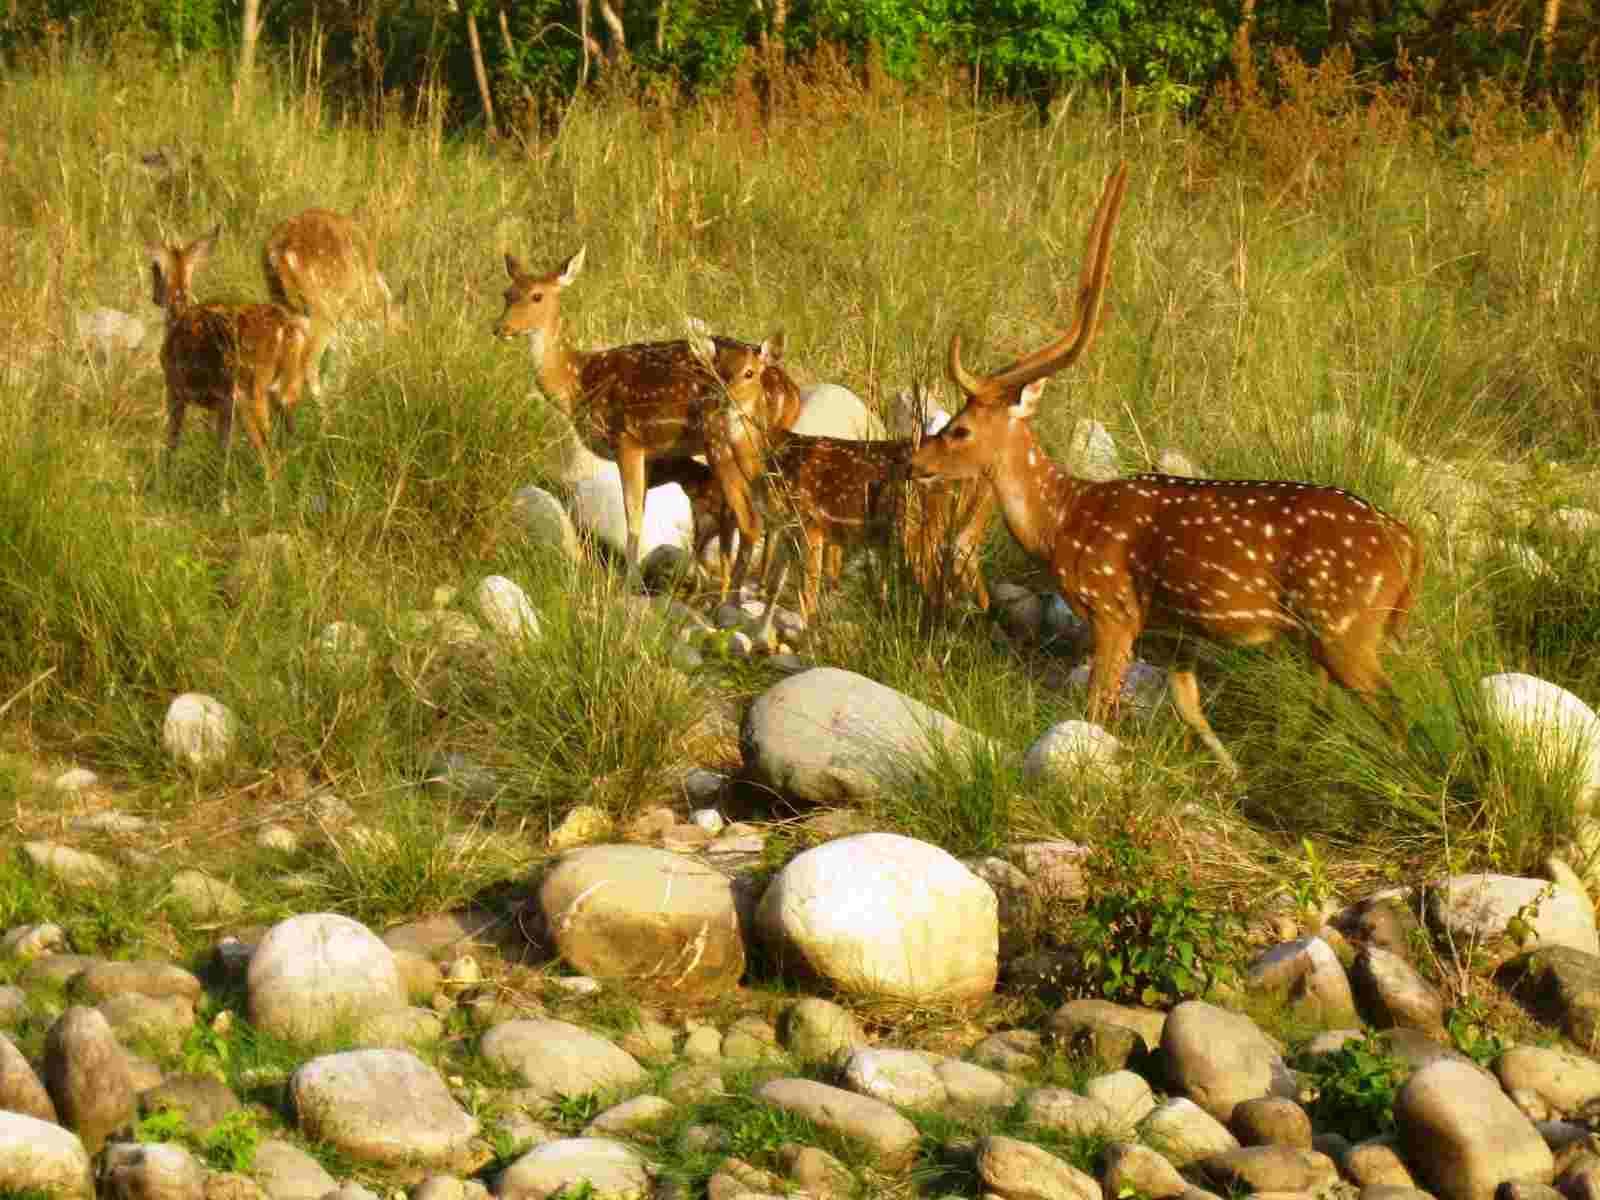 Jungle Safari at the Jim Corbett National Park